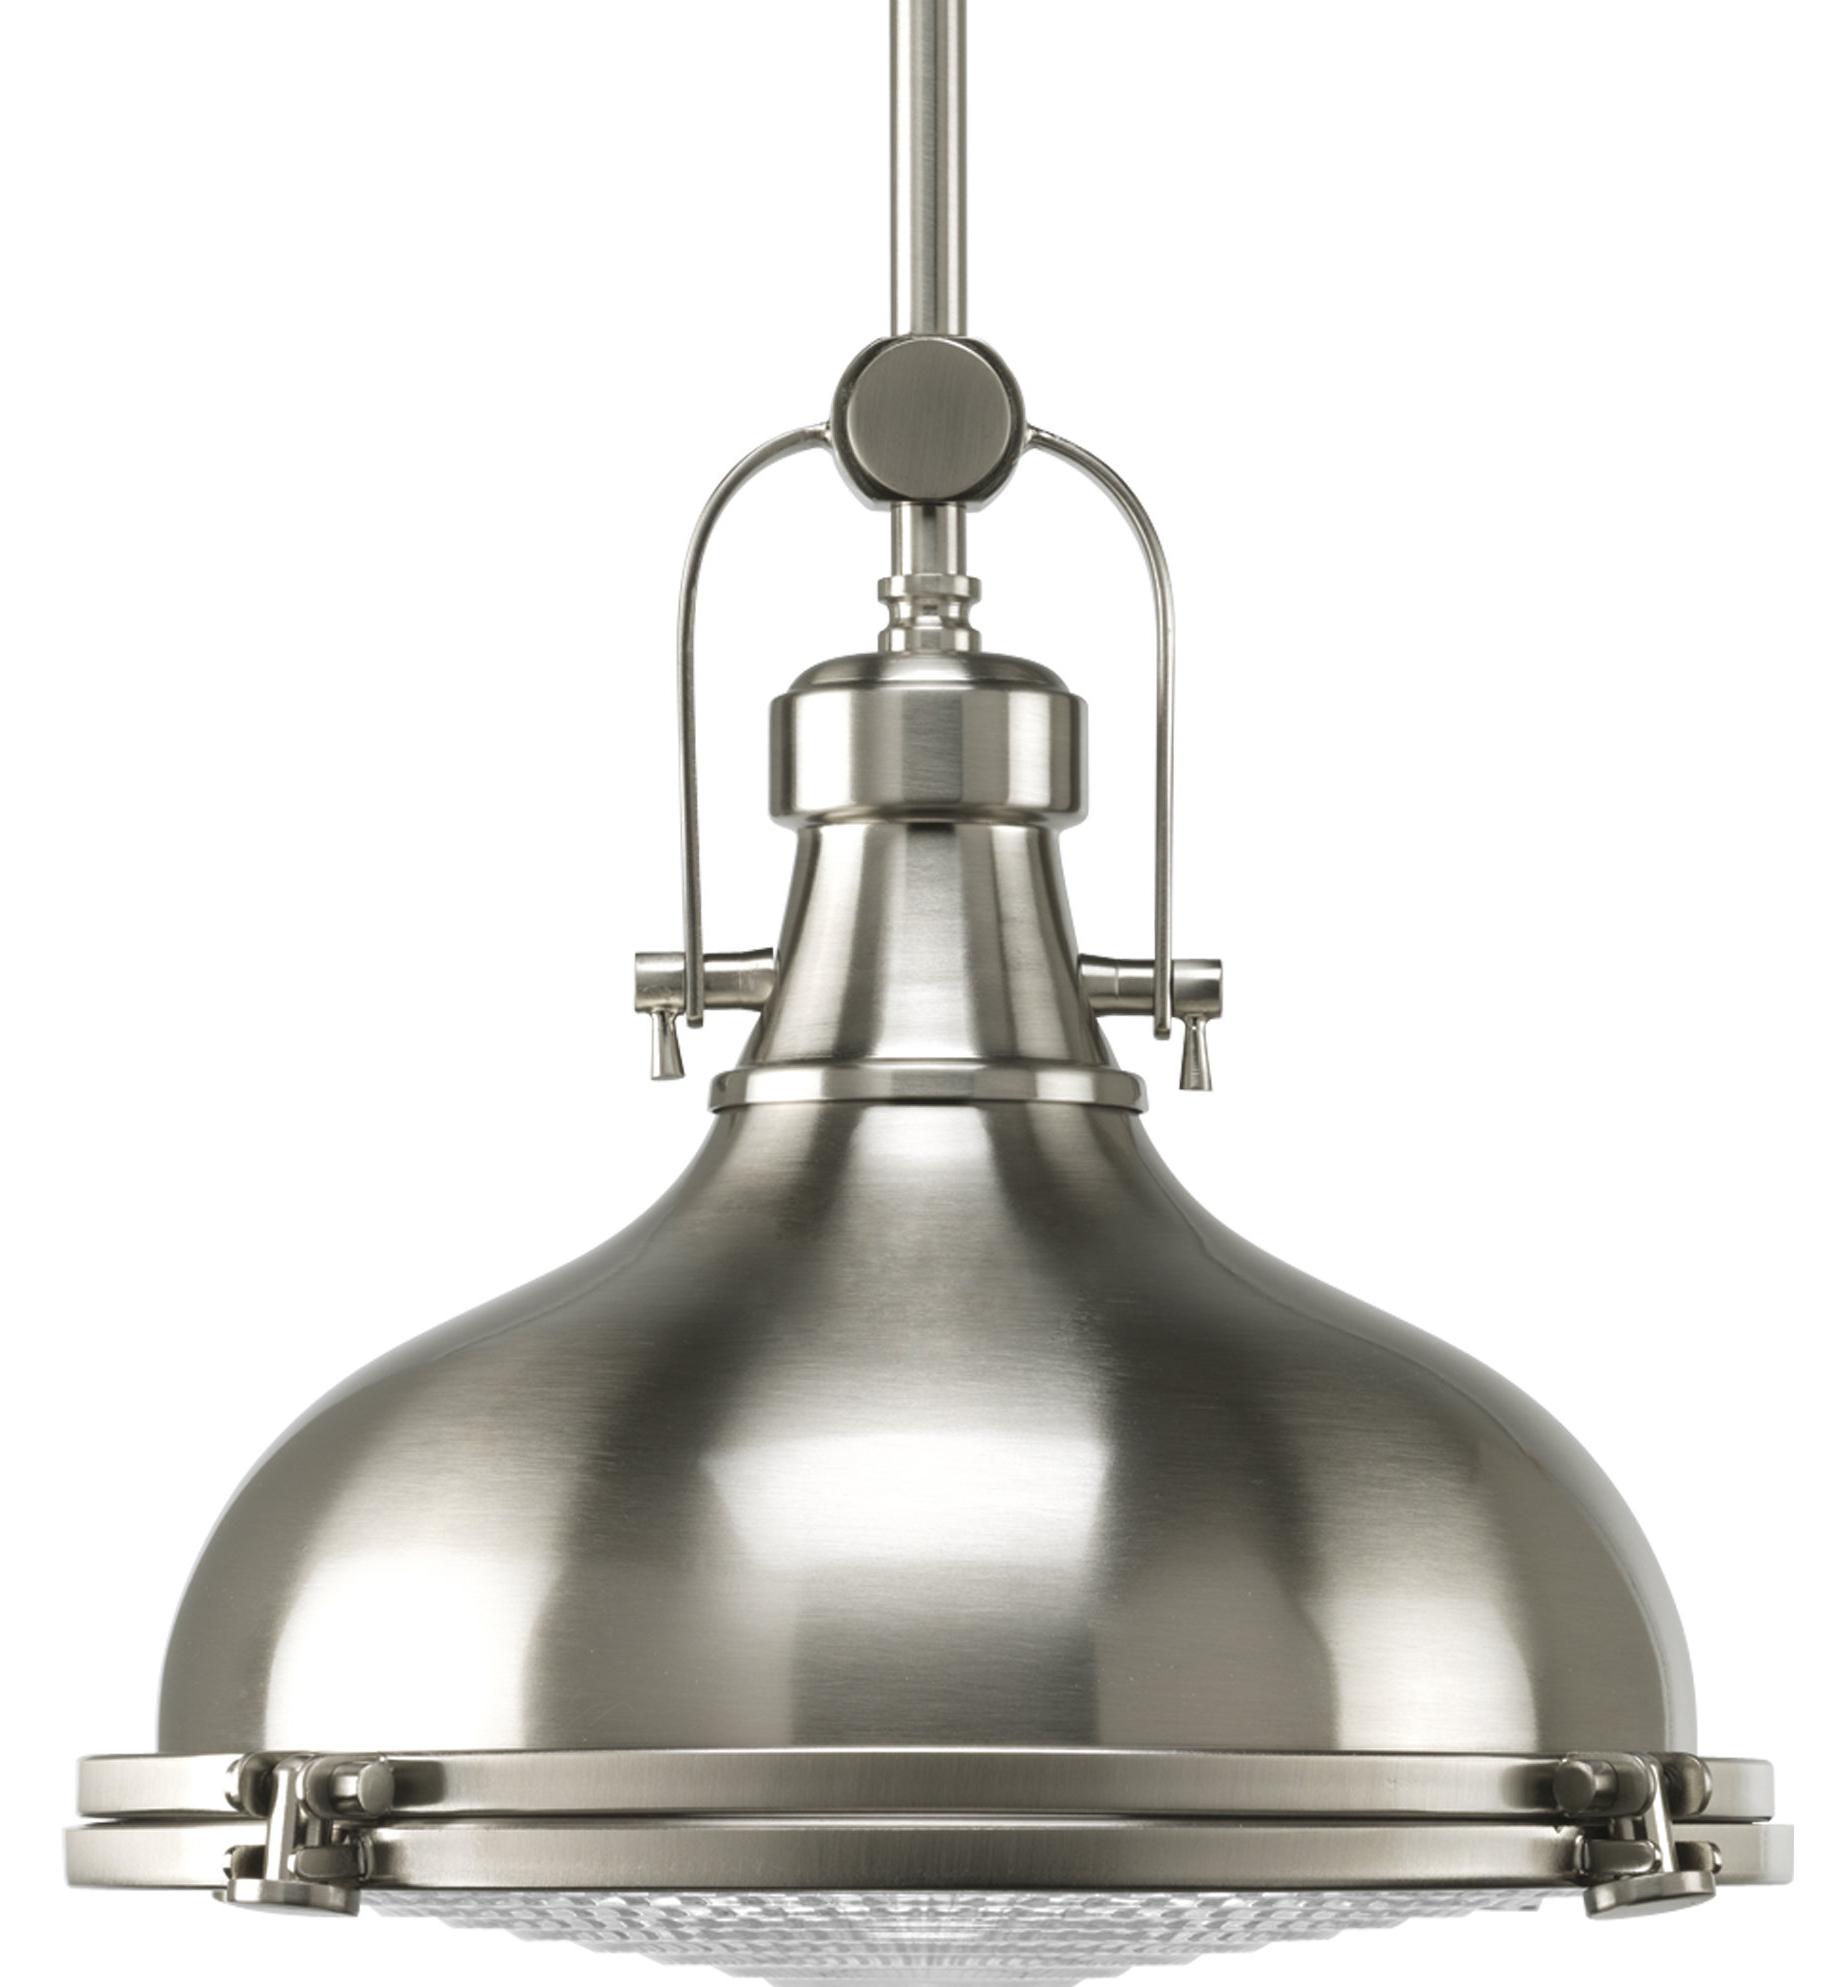 2019 Laurel Foundry Modern Farmhouse Freeda 1 Light Single Dome Pendant Pertaining To Granville 3 Light Single Dome Pendants (View 18 of 25)